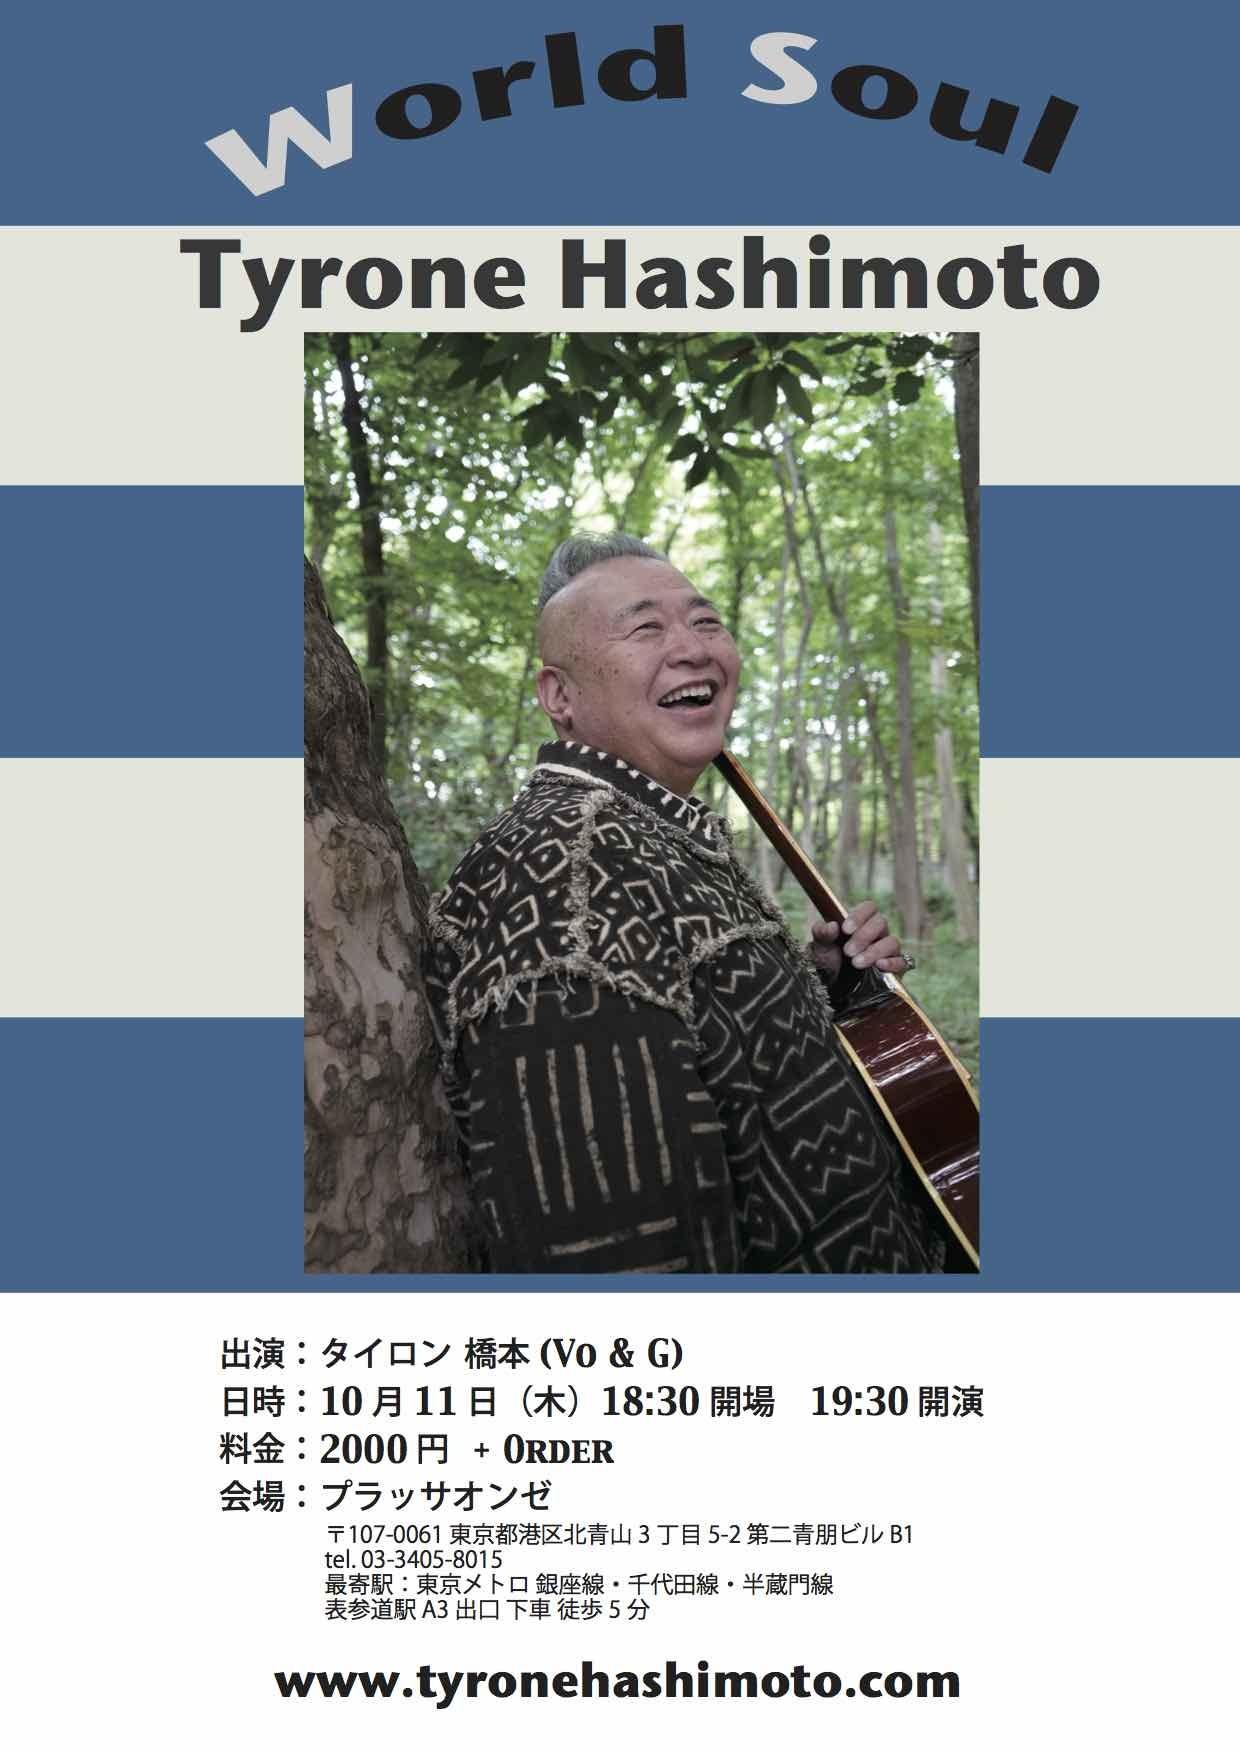 Tyrone Hashimoto 10月 ライブ情報_c0368808_02162108.jpg